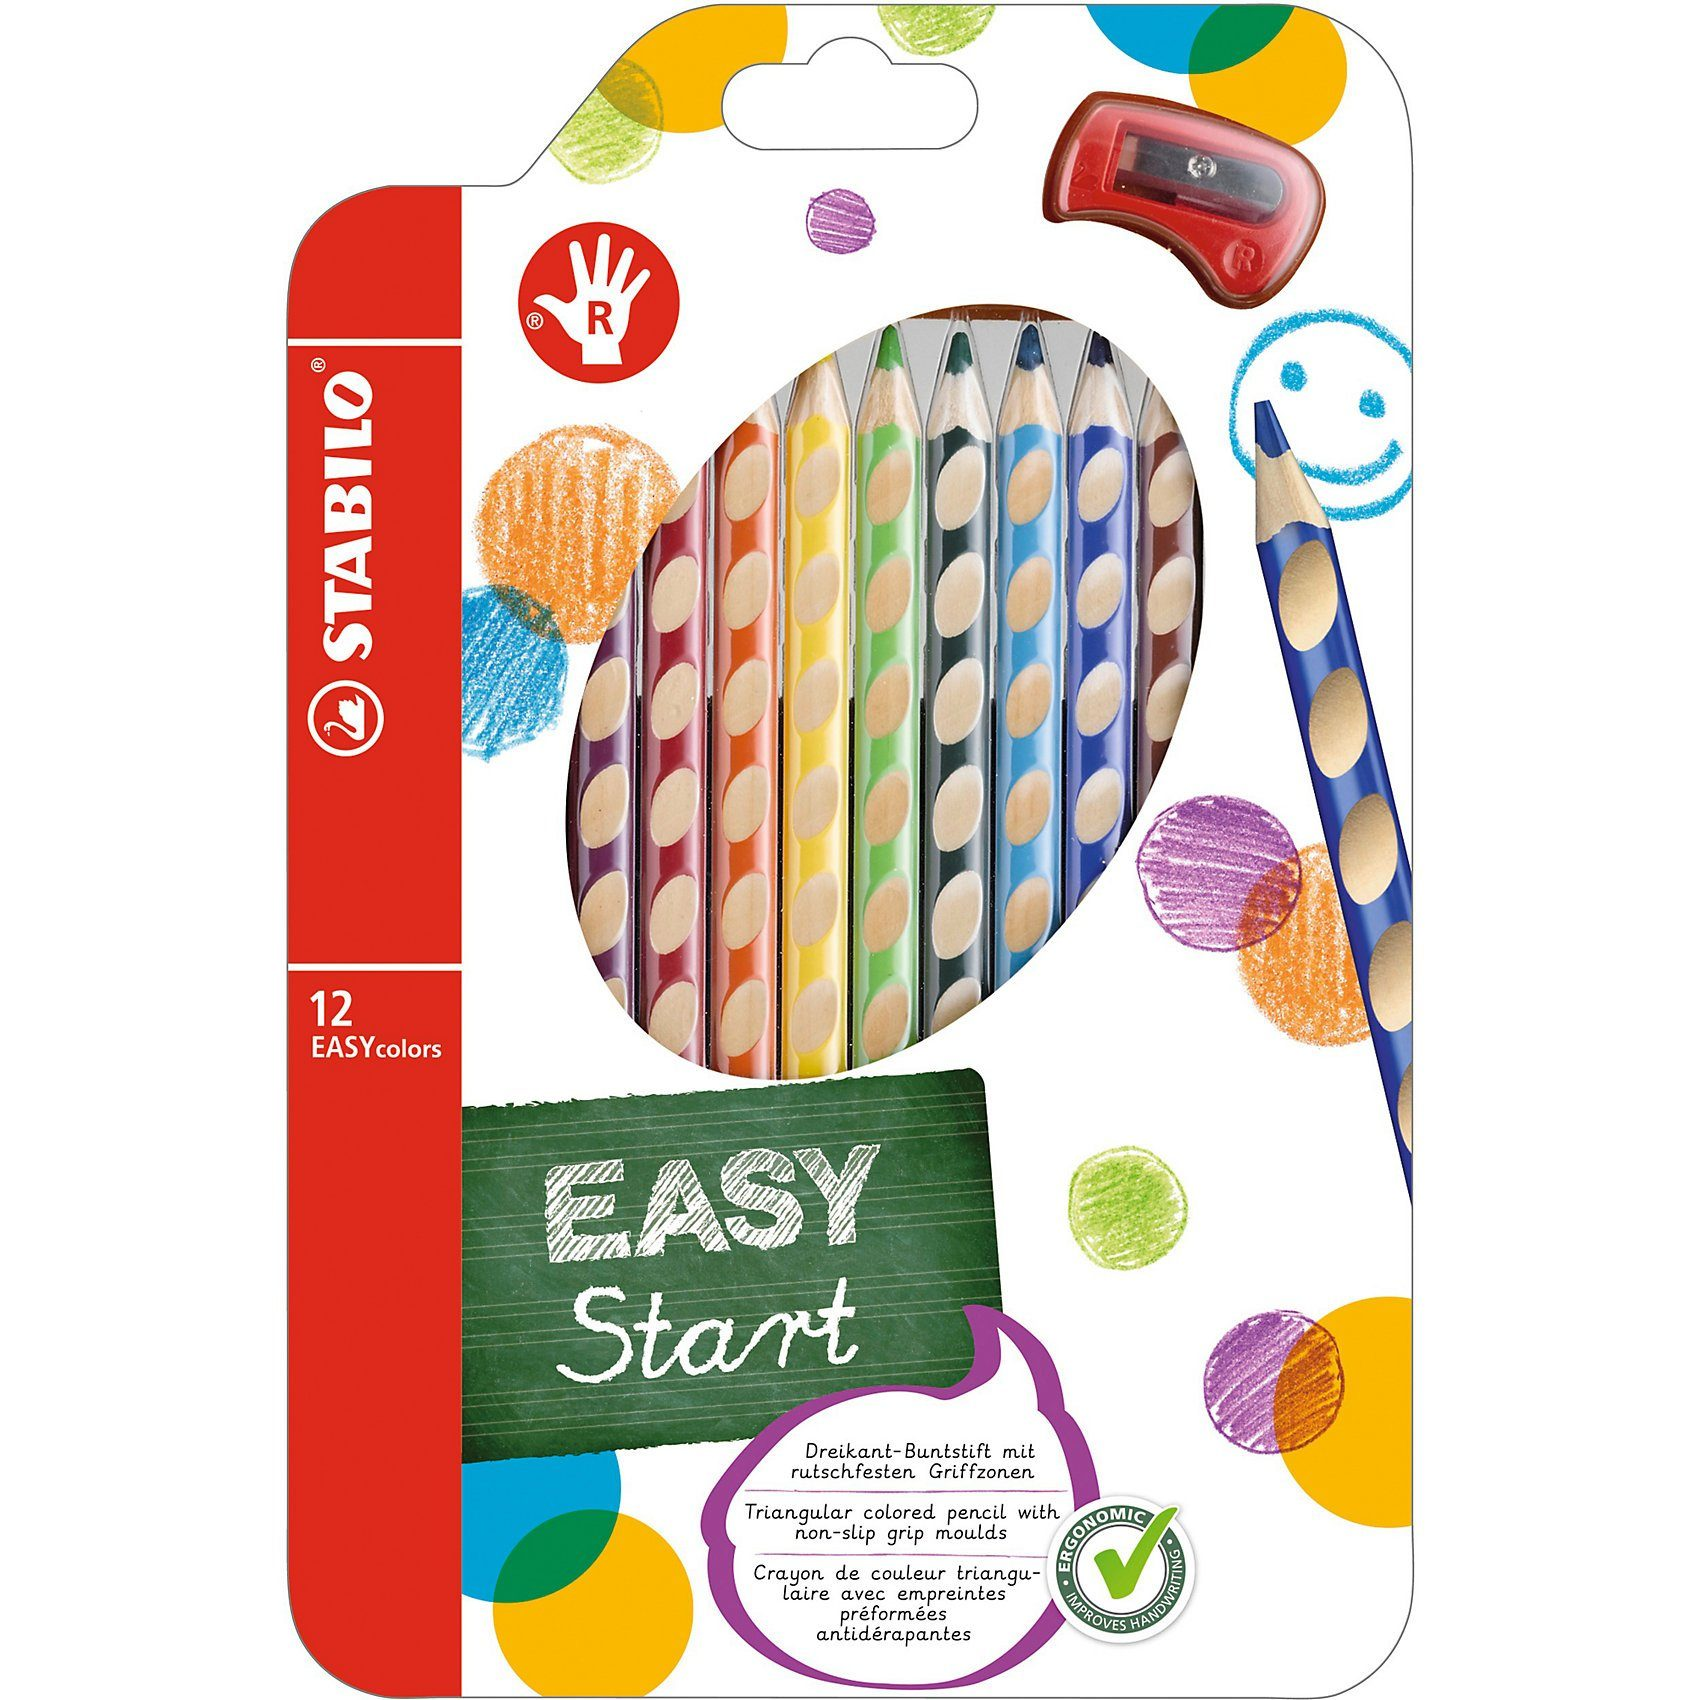 Stabilo Buntstift EASYcolors R, inkl. Spitzer, 12 Farben